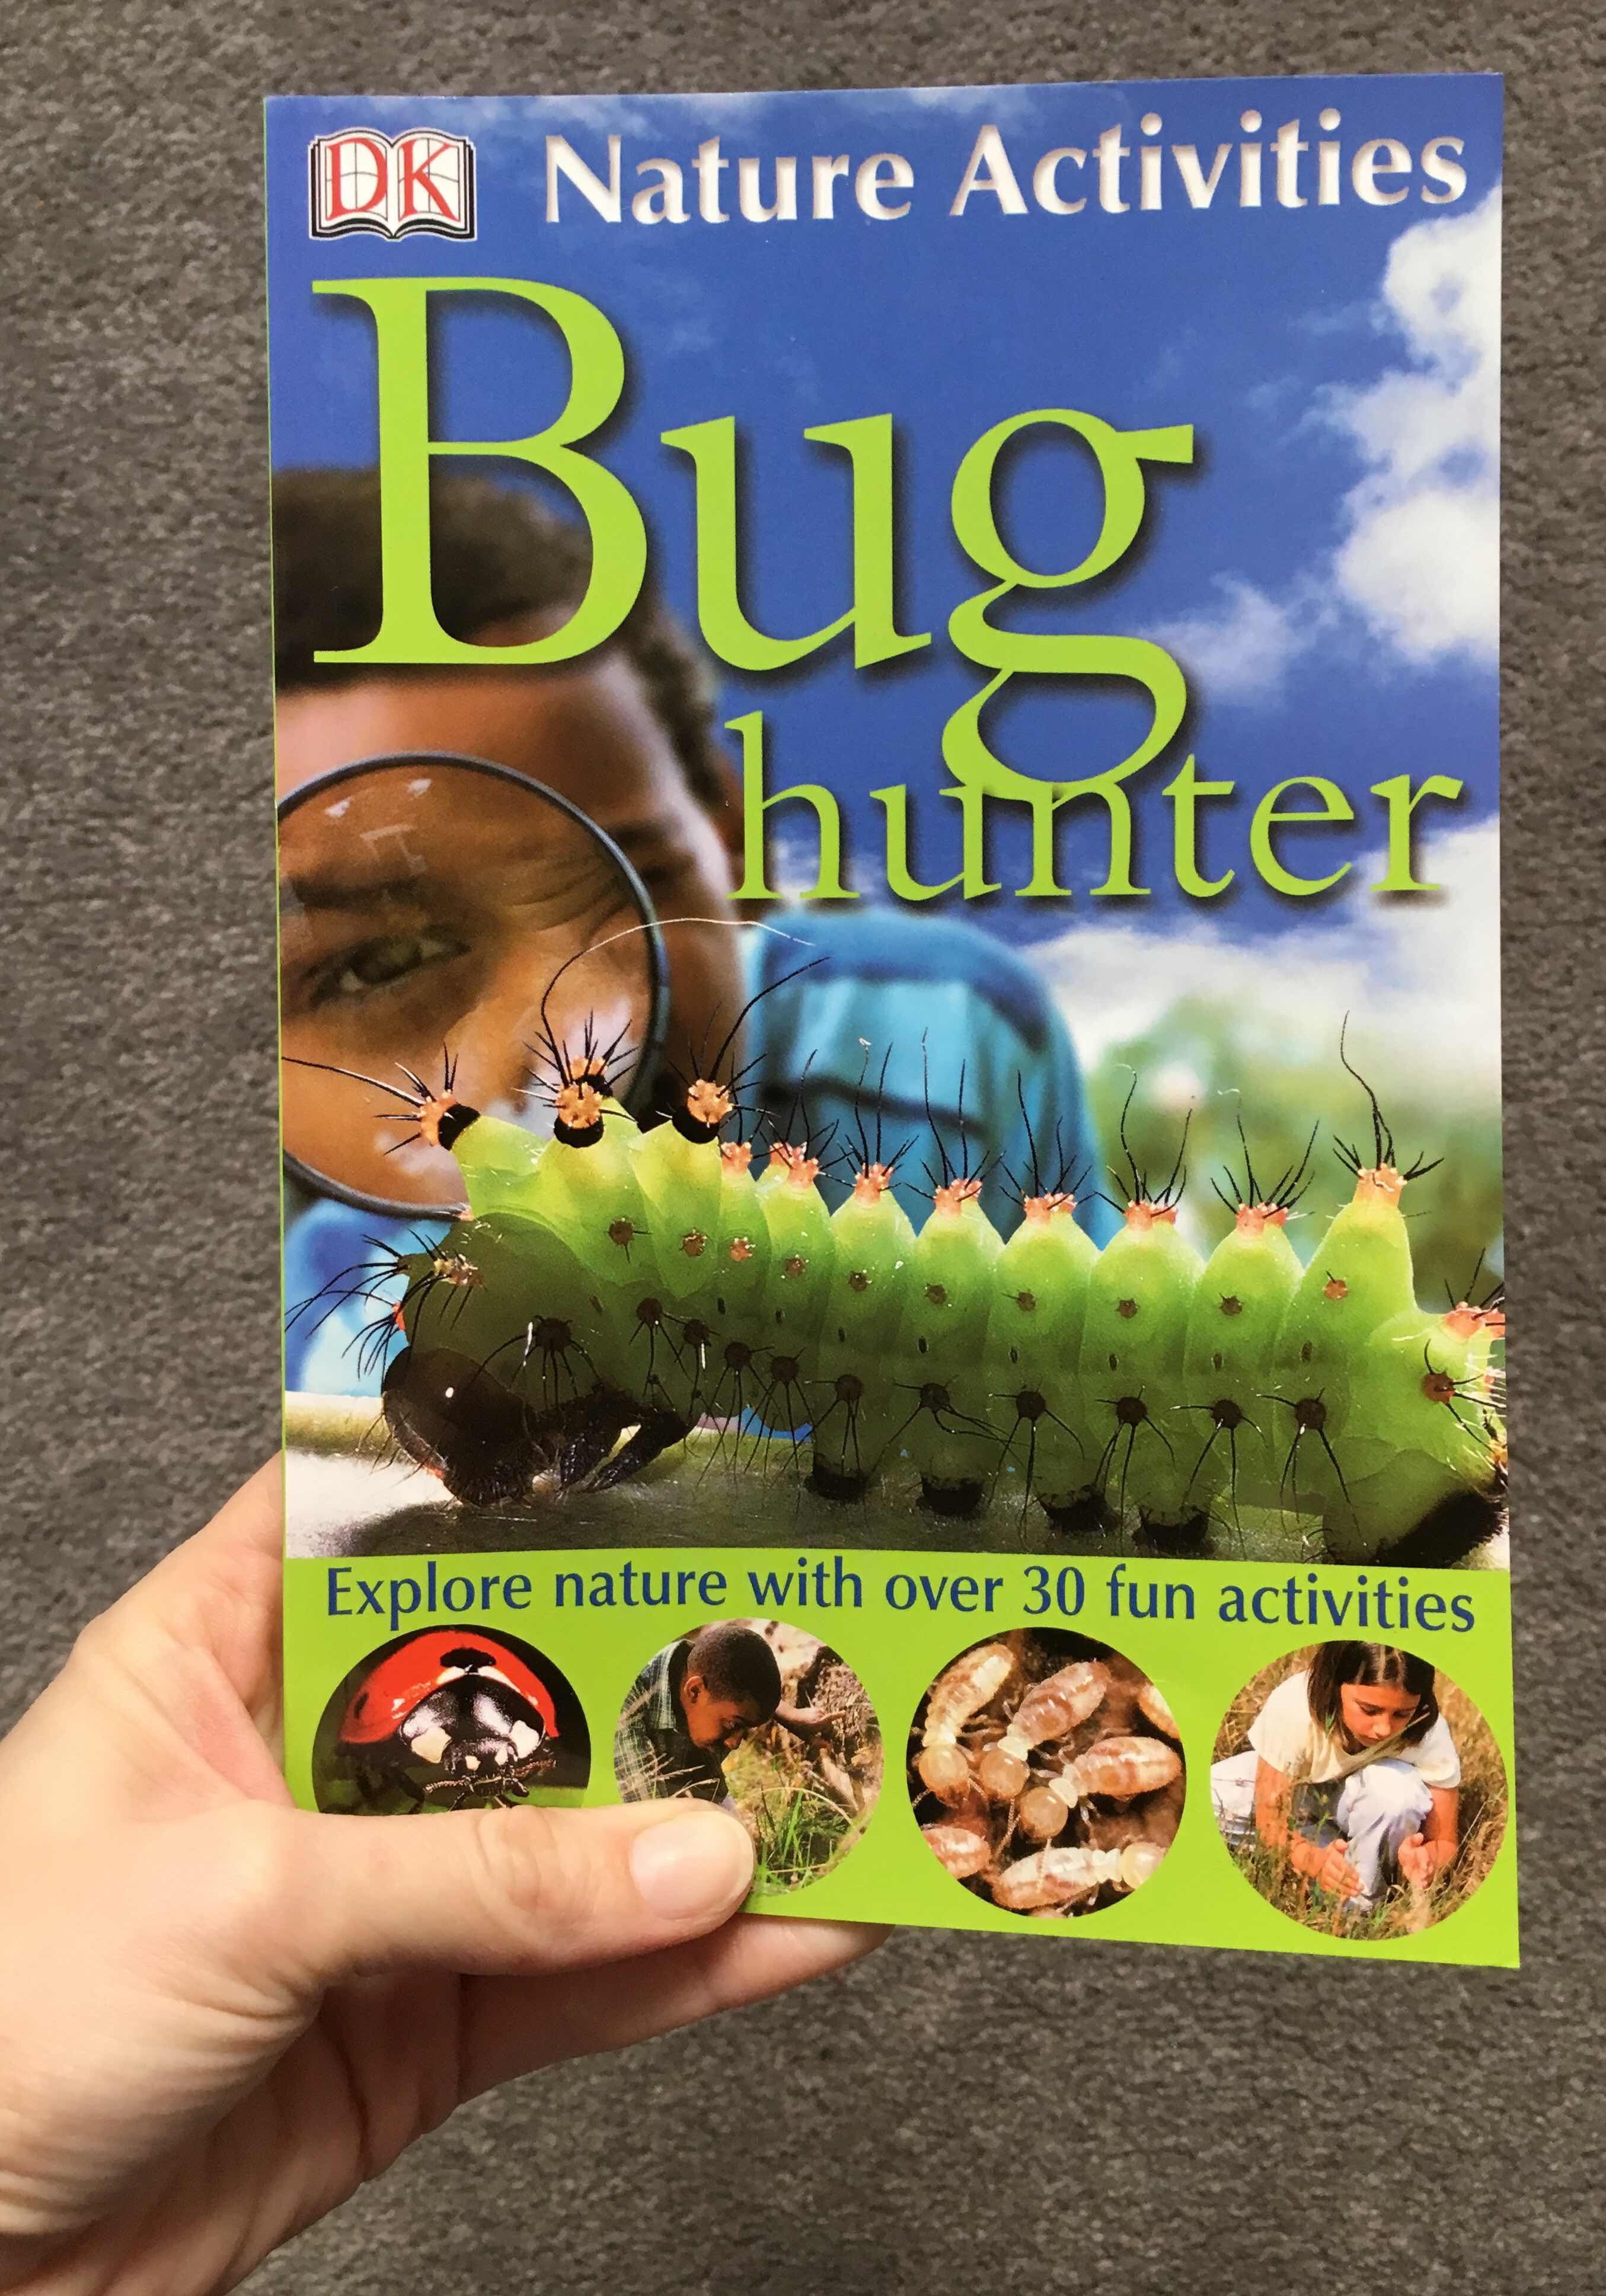 DK Bug Hunter book